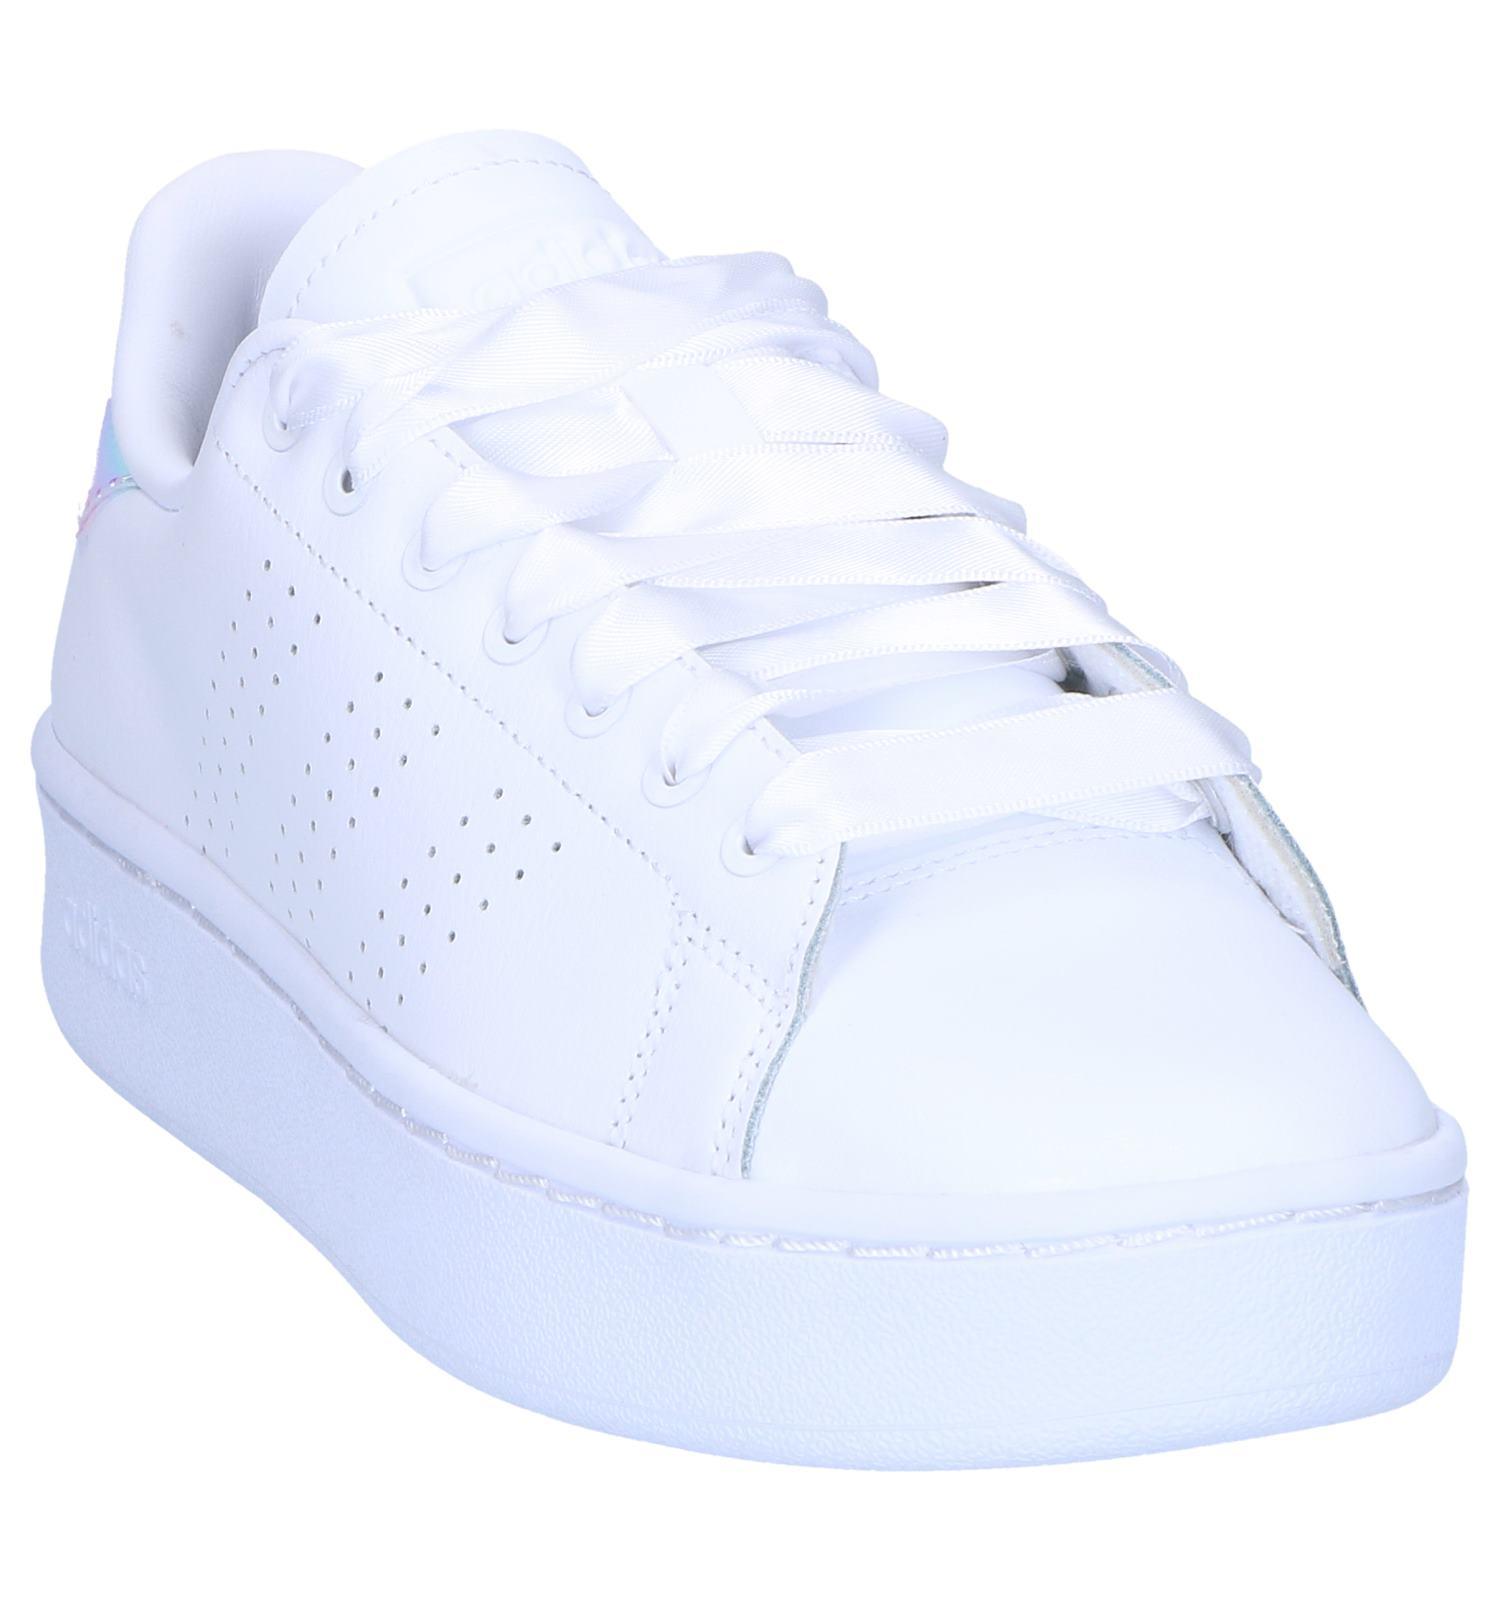 Witte Sneakers adidas Advantage Bold | TORFS.BE | Gratis ...